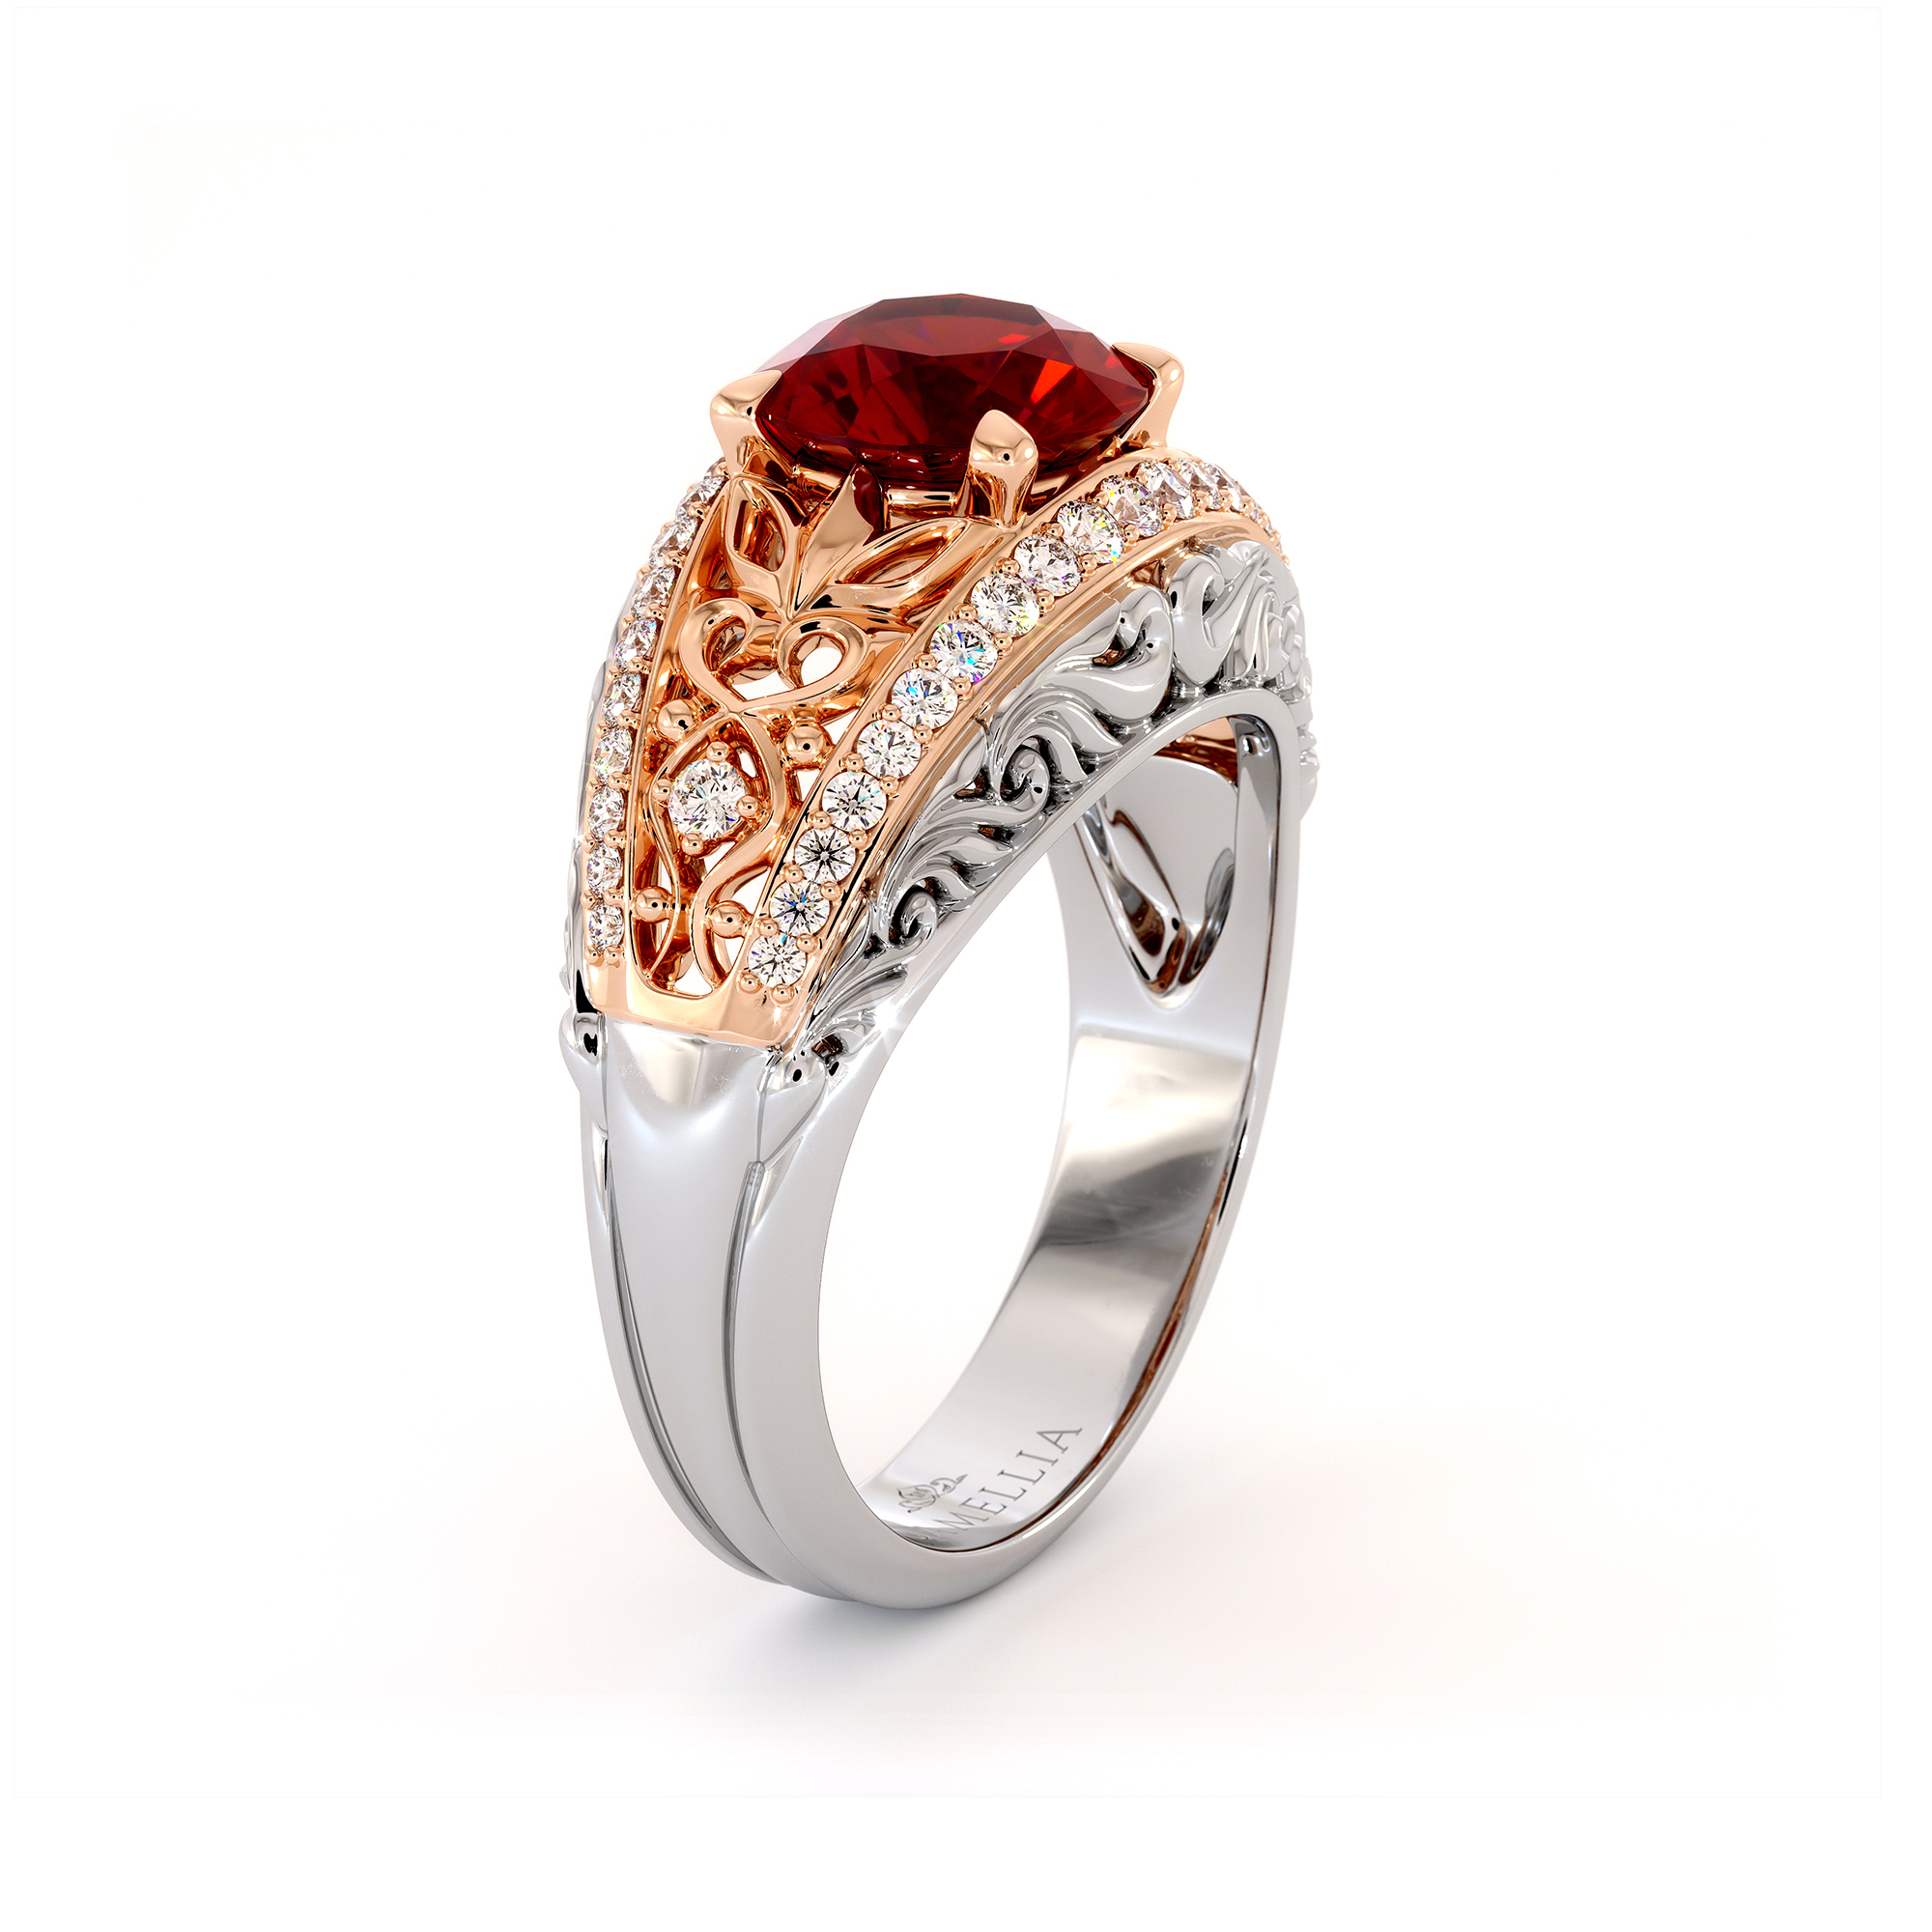 1.5 Carat Natural Ruby Unique Ring Vintage Filigree Solid Gold Engagement Ring